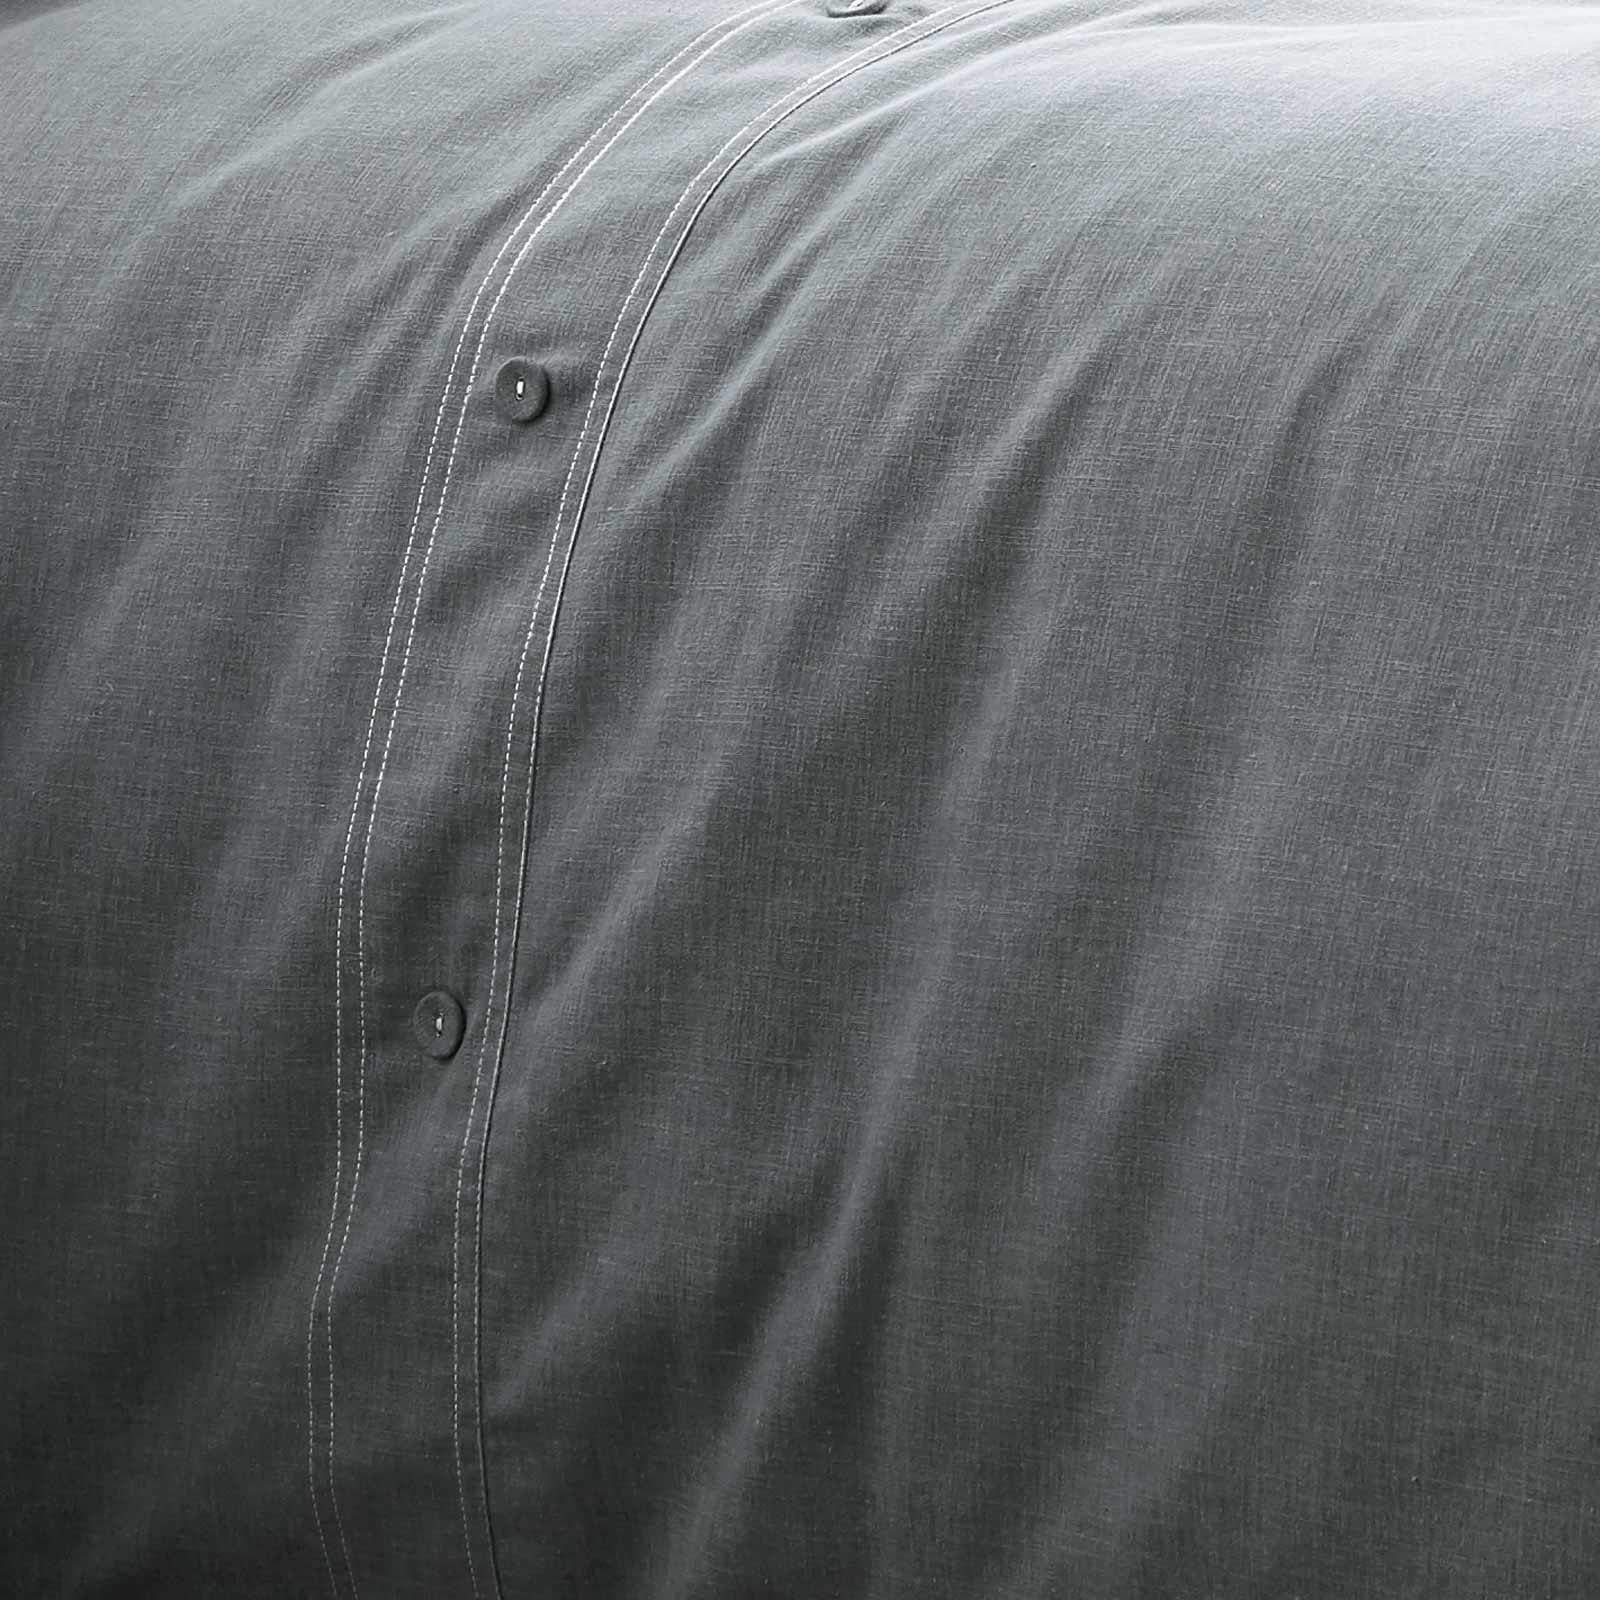 Azul-fundas-nordicas-Denim-Chambray-Boton-Detalle-de-lujo-cubierta-del-edredon-conjuntos-de-cama miniatura 18